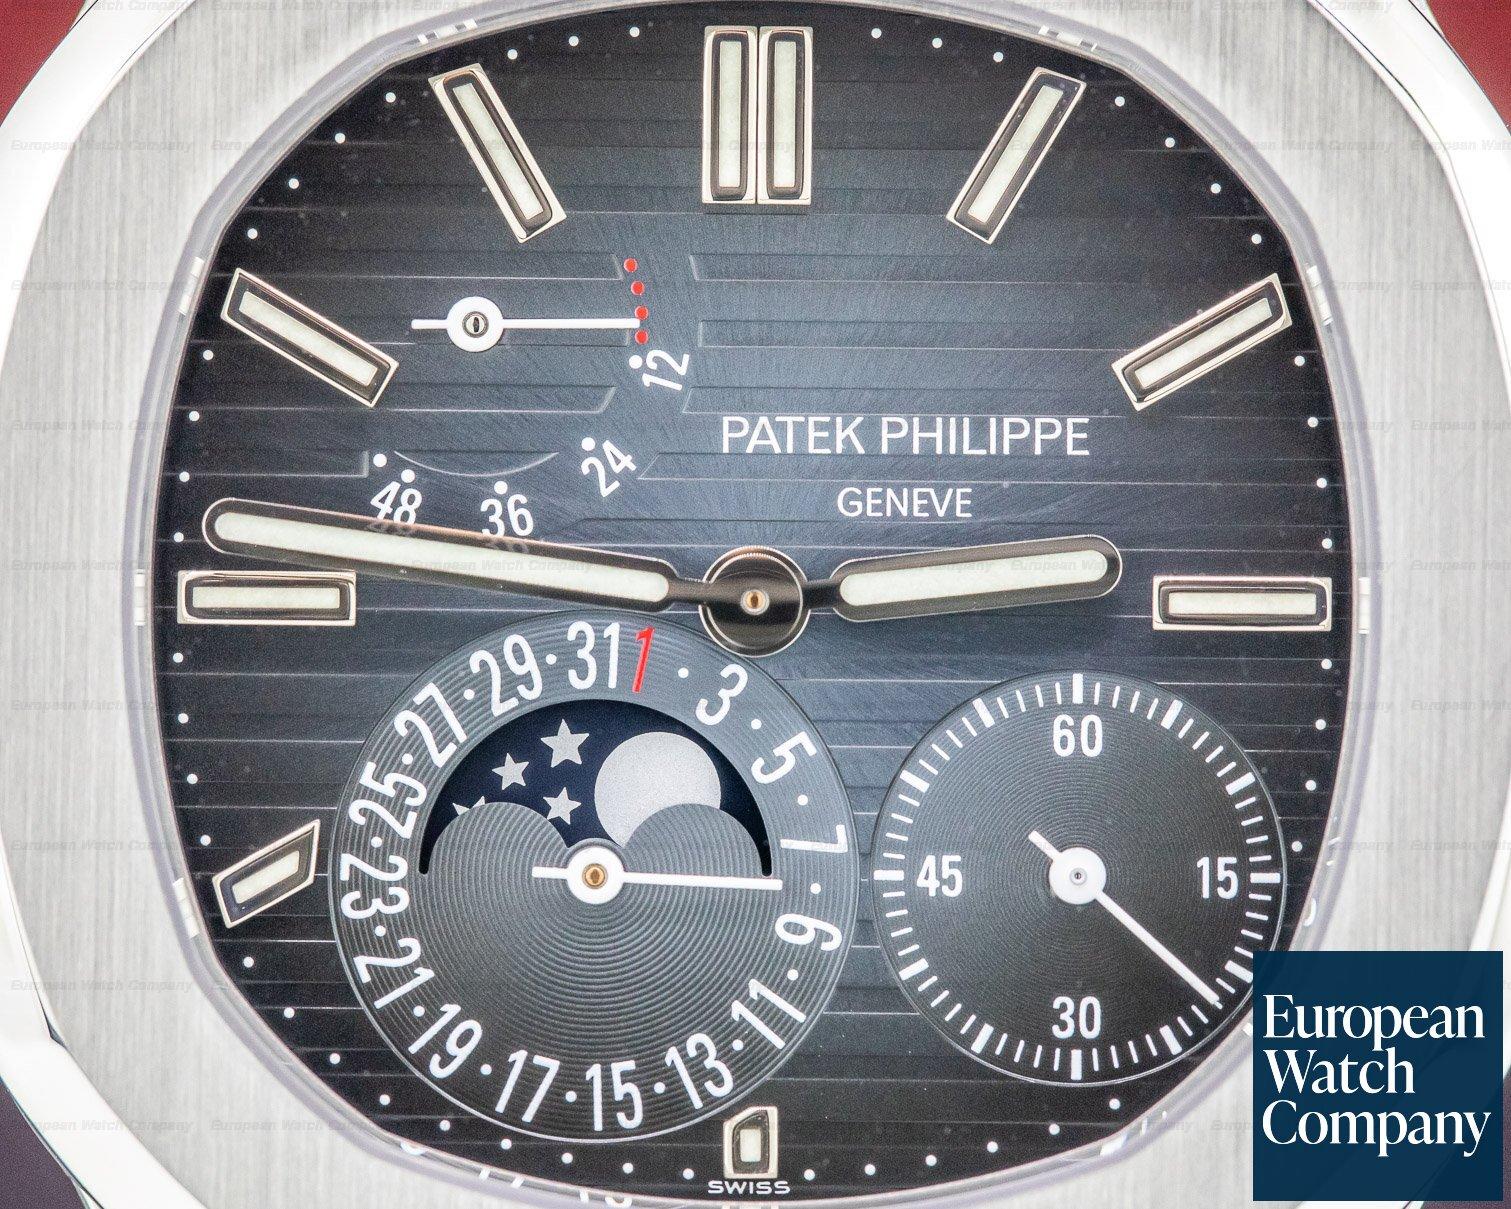 Patek Philippe 5712/1A-001 Jumbo Nautilus Moonphase Power Reserve SS